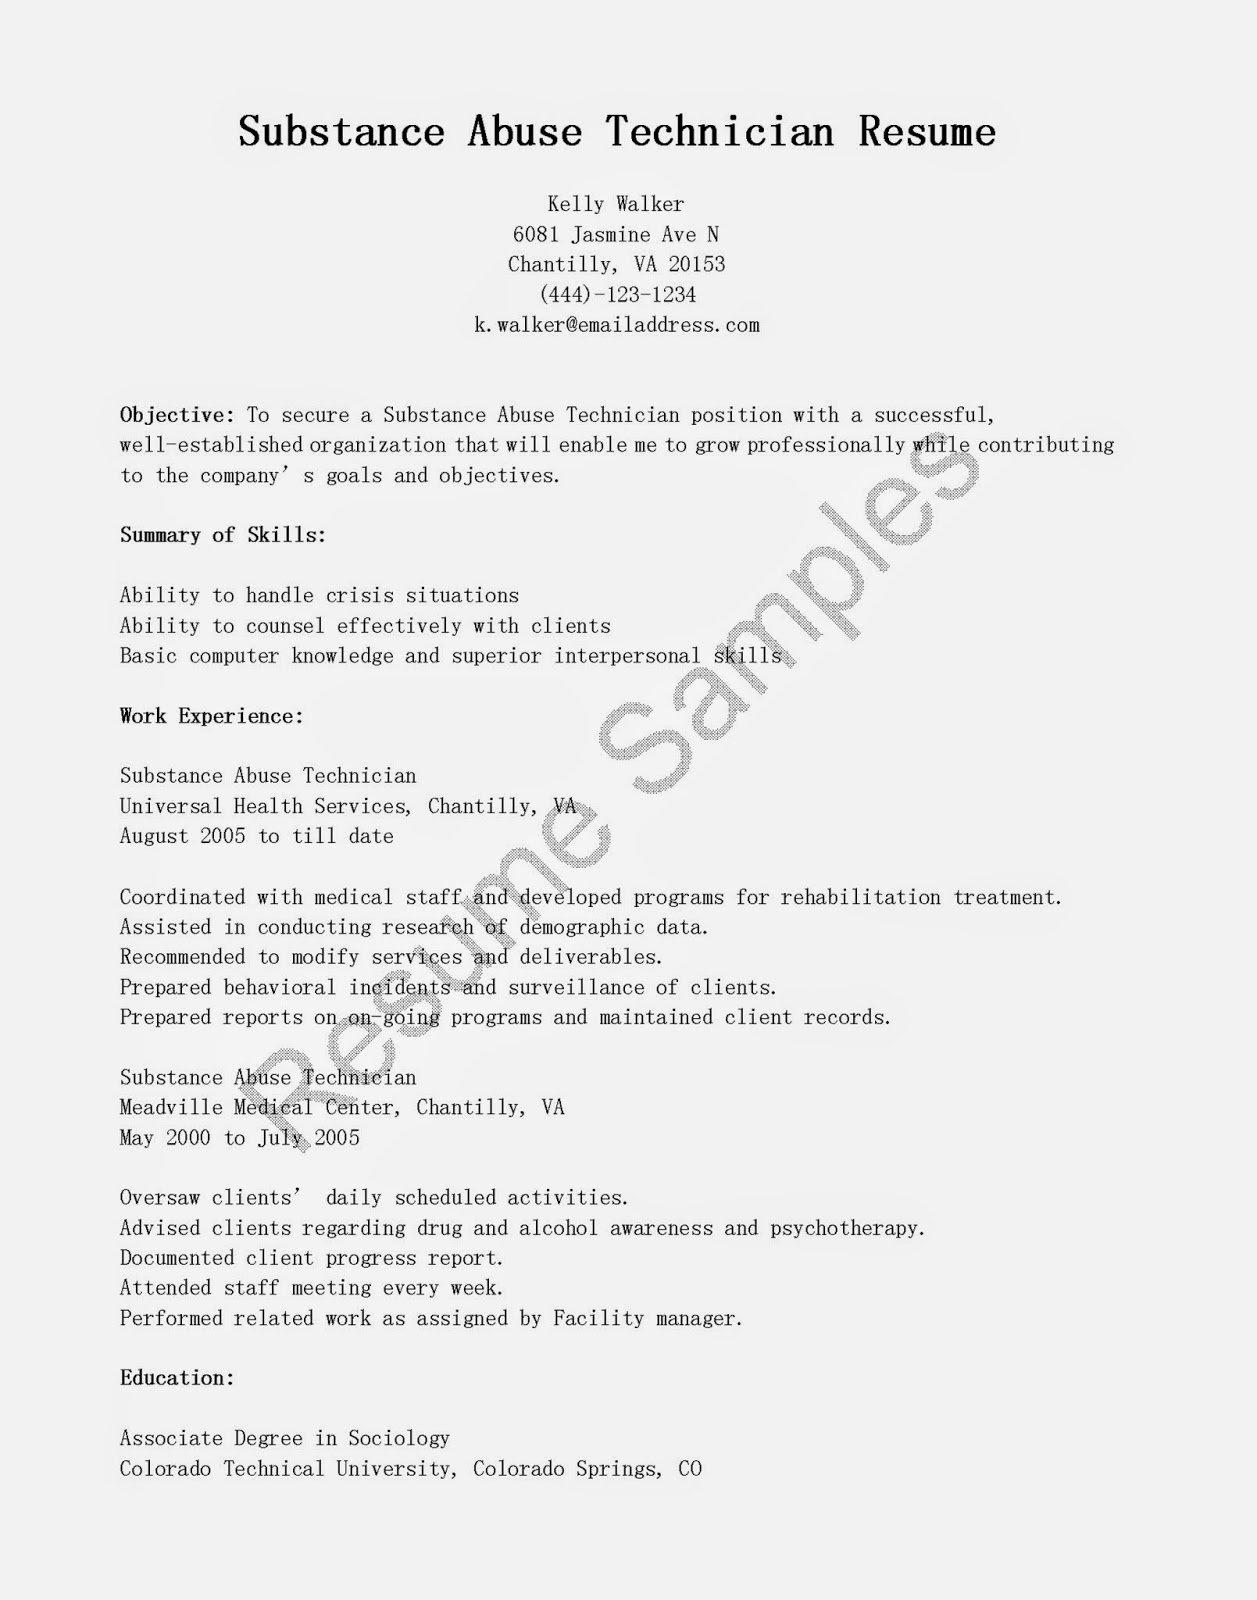 Resume Samples Substance Abuse Technician Resume Sample